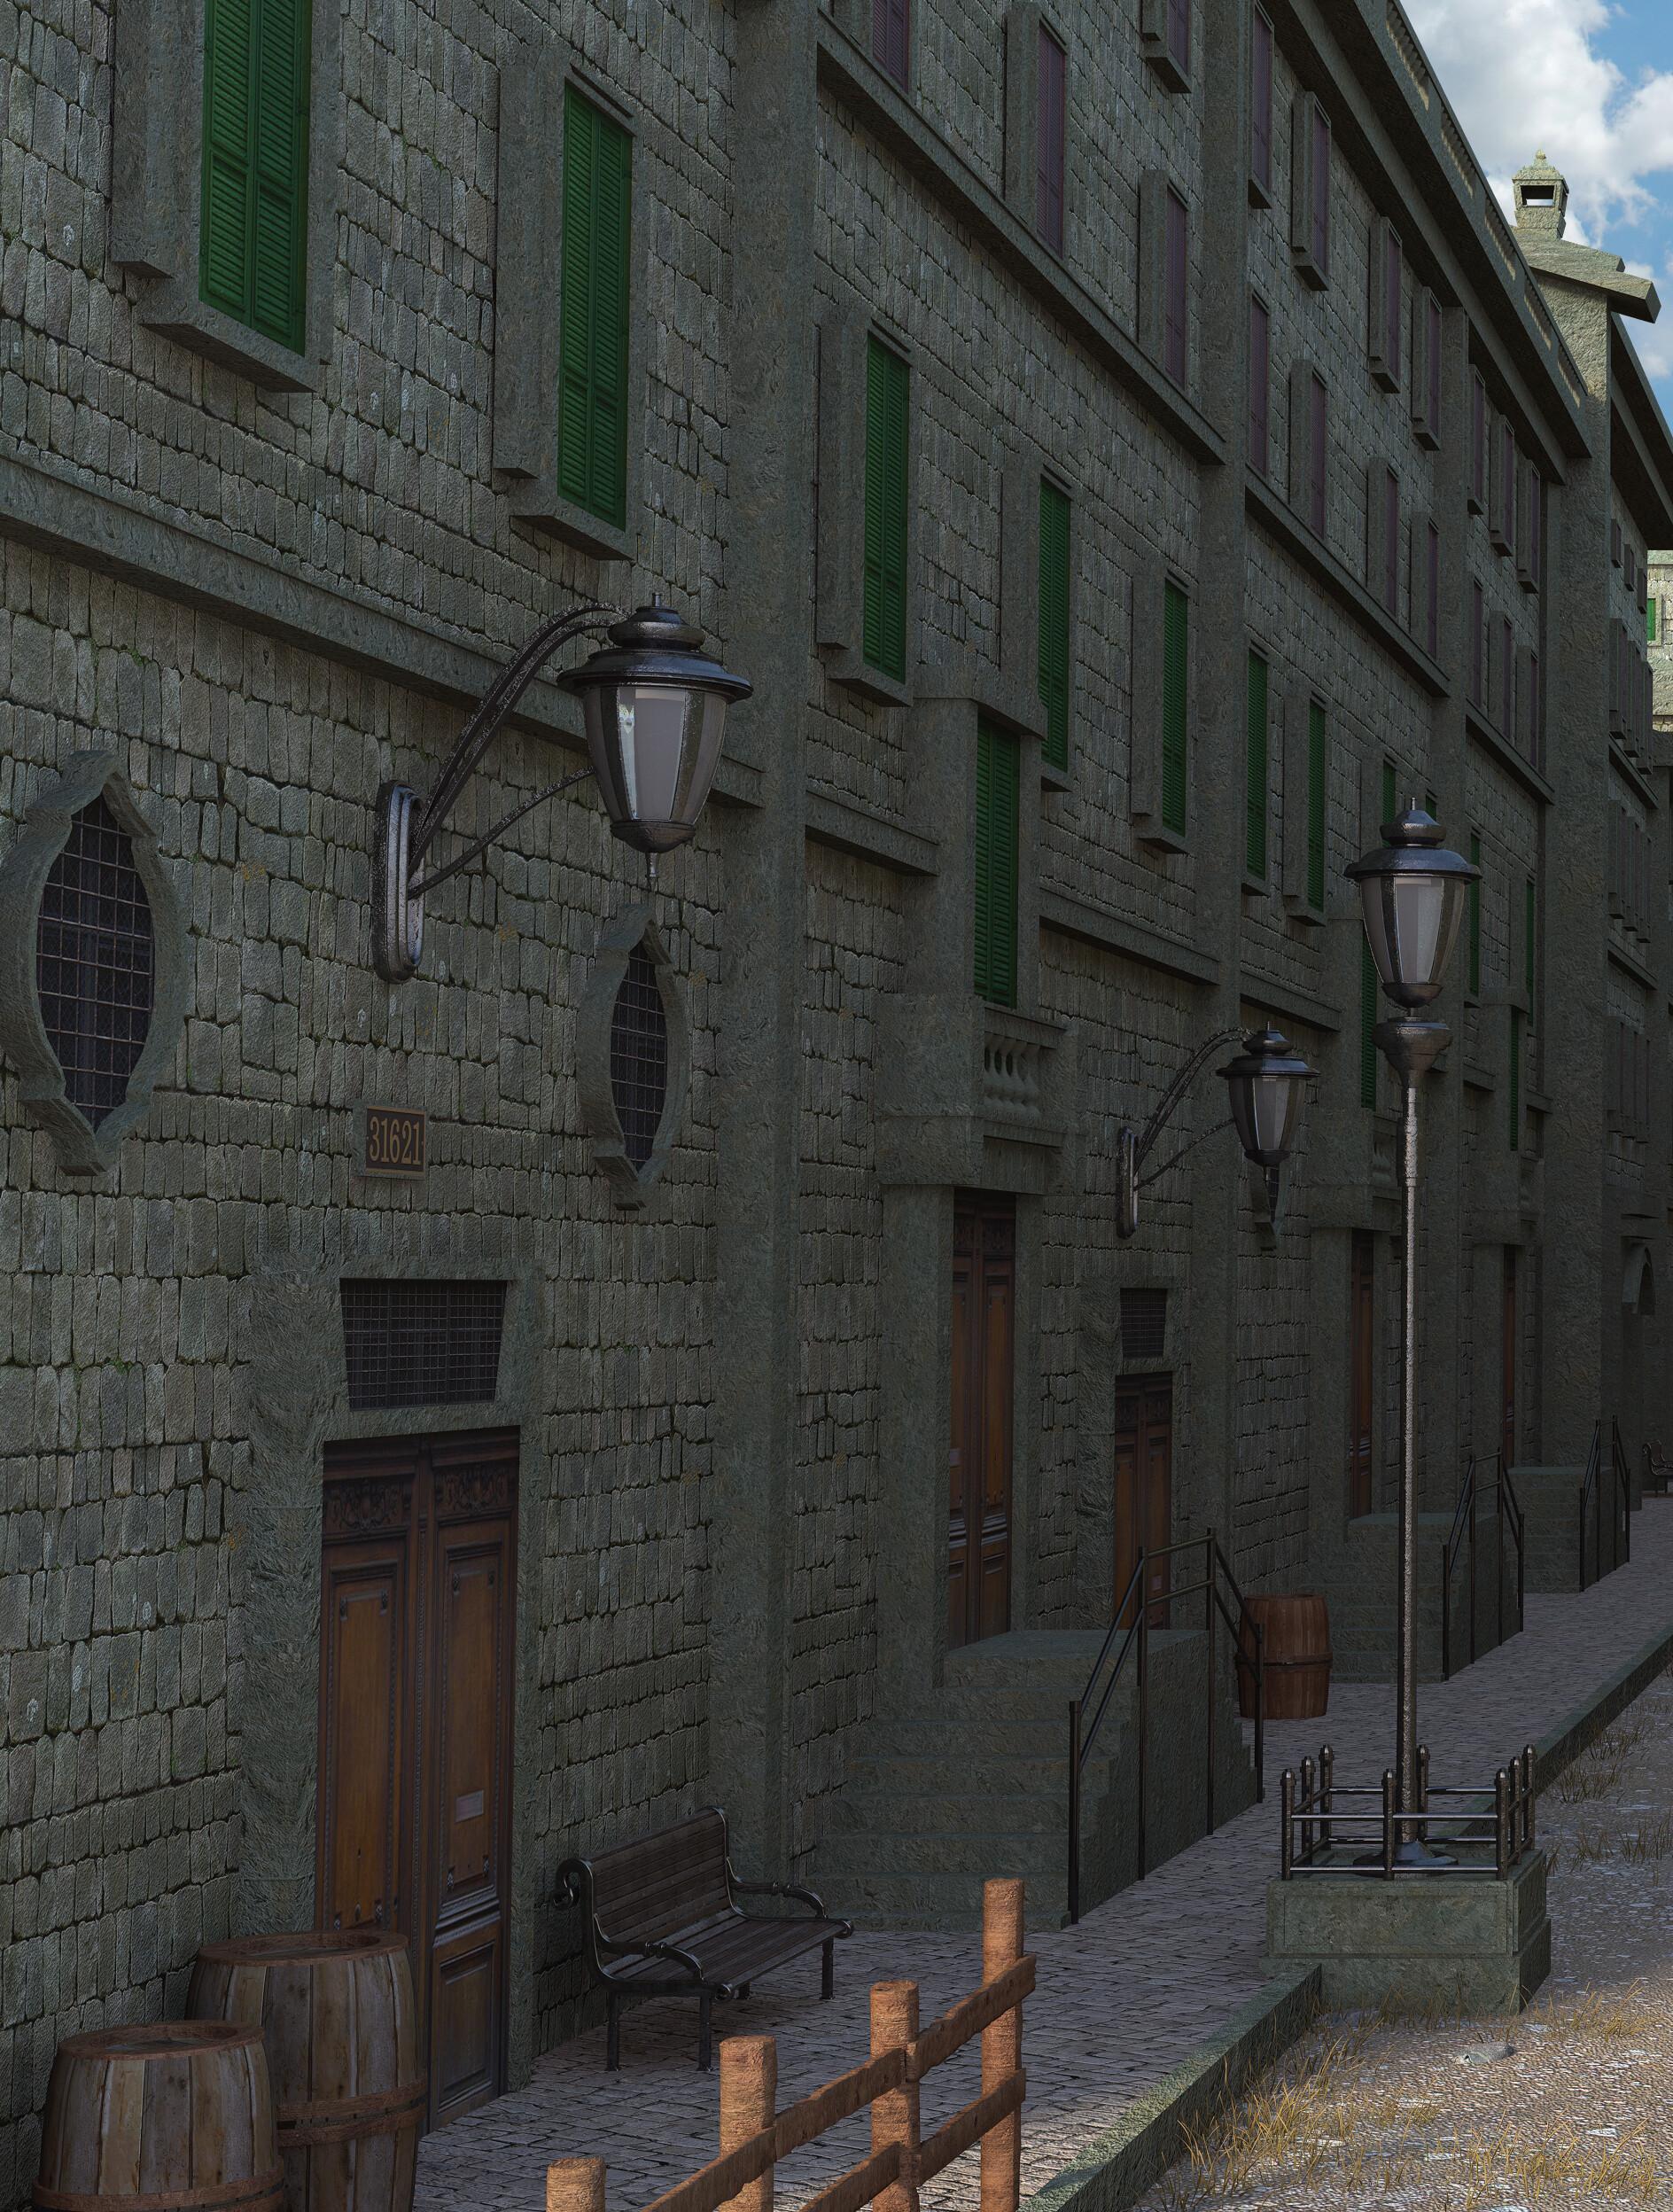 Marc mons street6